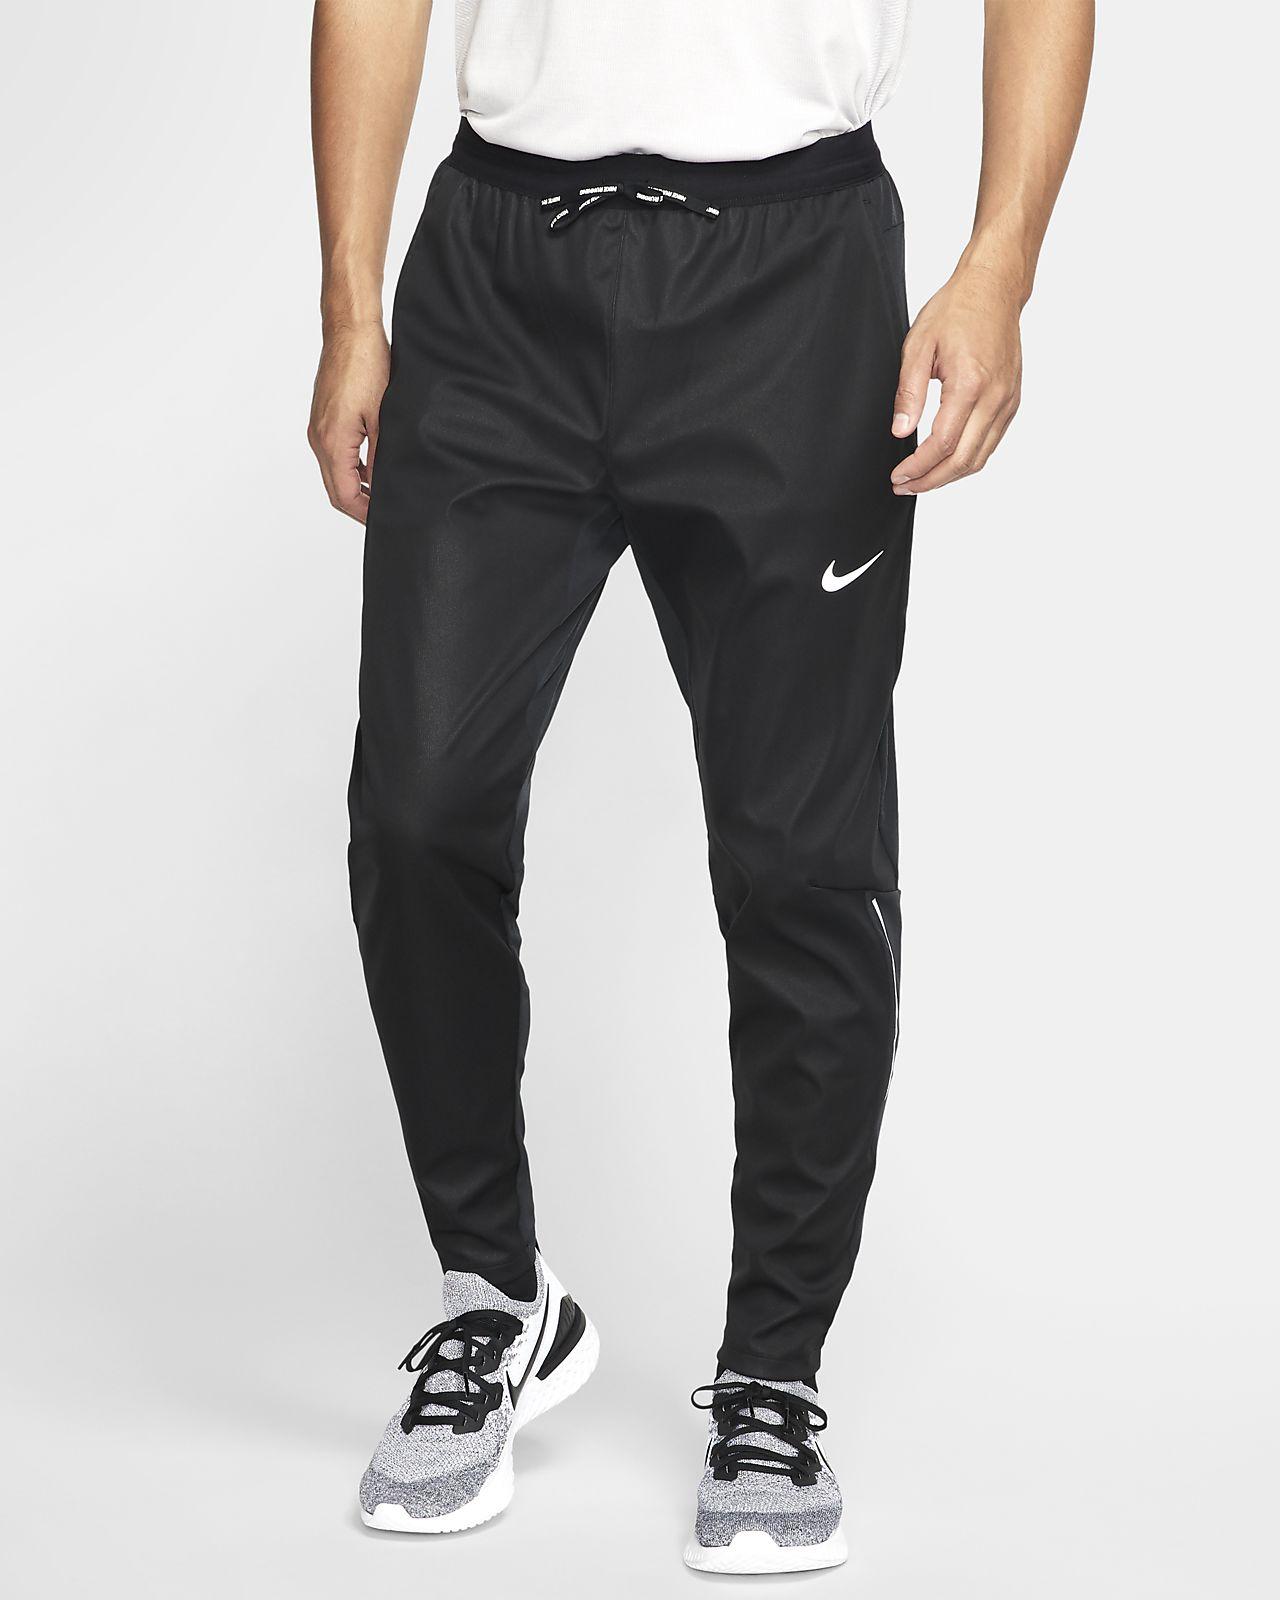 Nike Shield Phenom Hardloopbroek voor heren